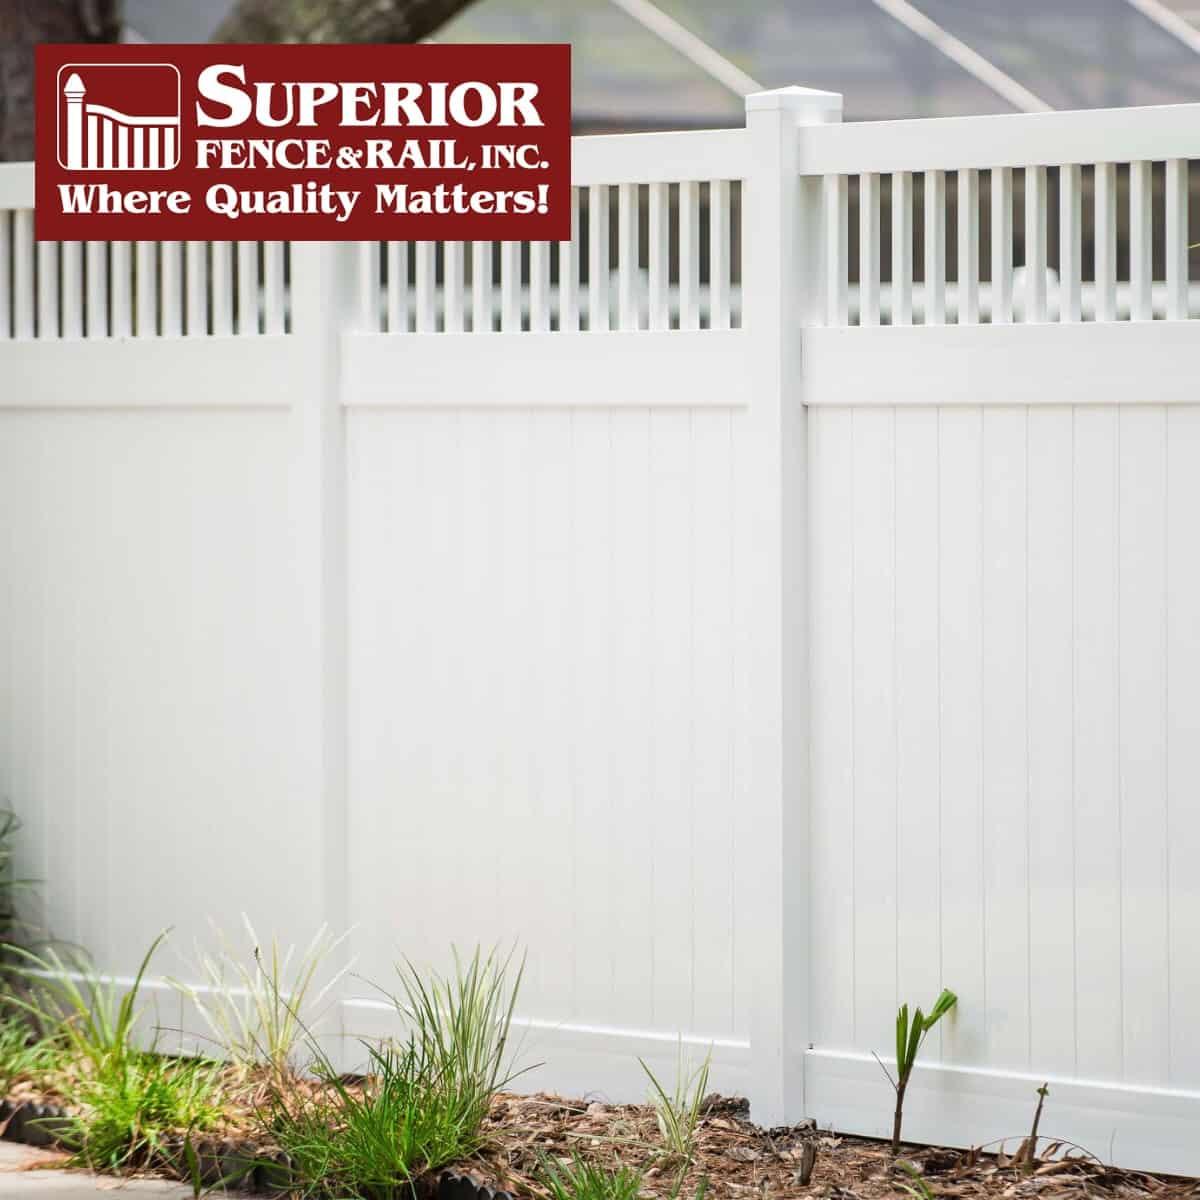 Crawfordville Fence Company Contractor